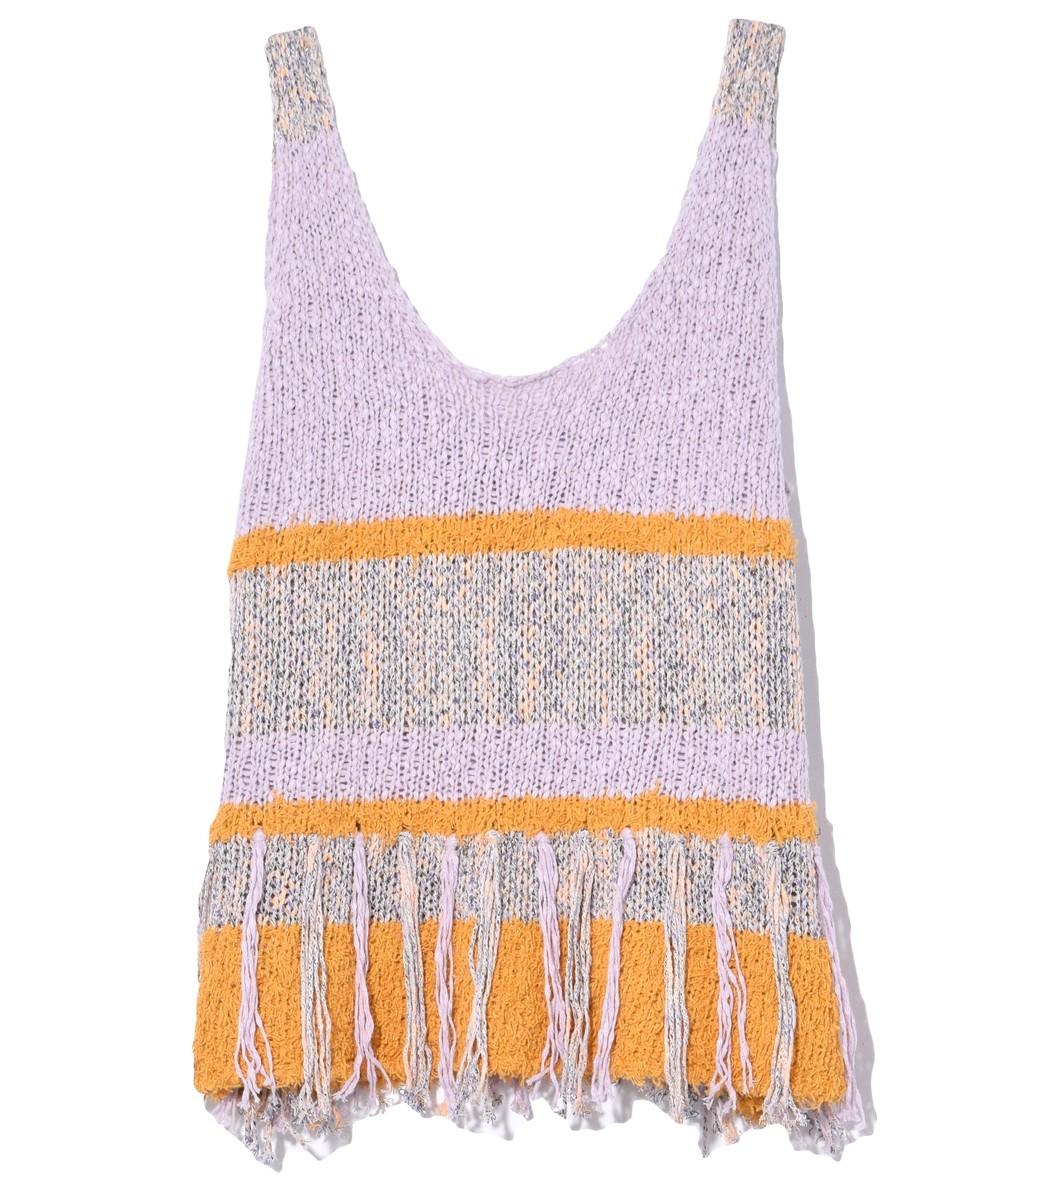 Raquel Allegra Knits Knit Tank in Lilac/Gold